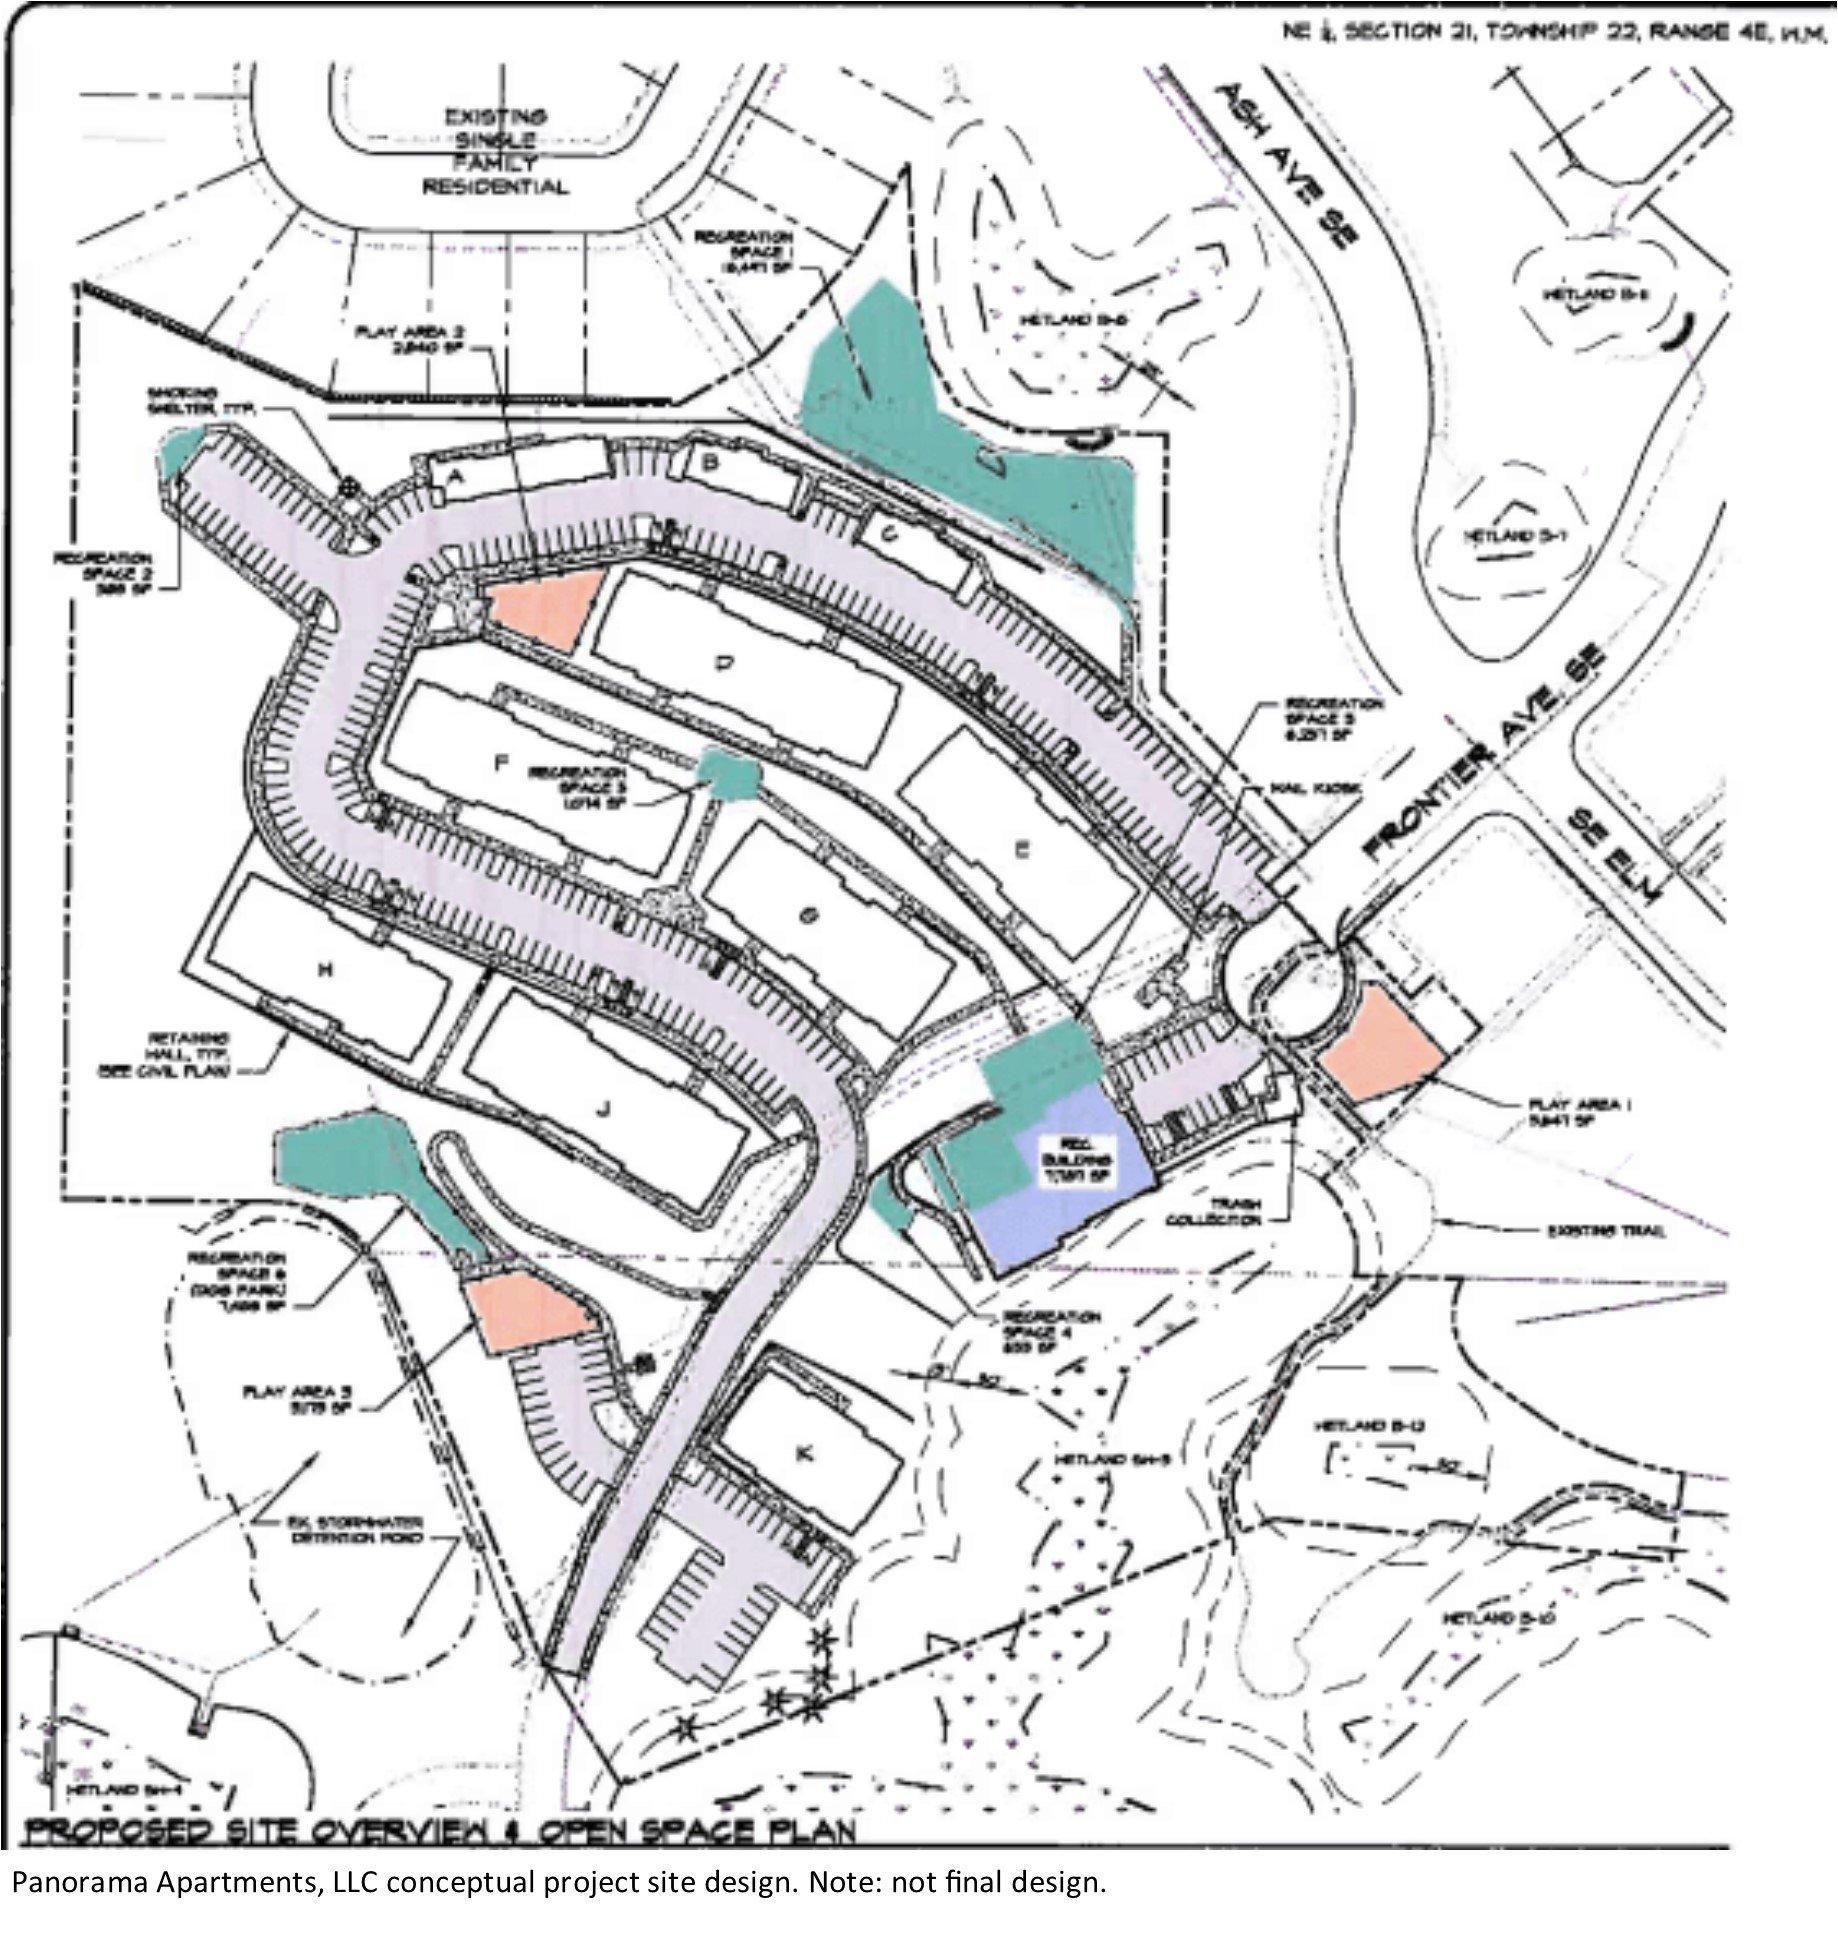 Denver Quick Permits: Real Estate News For Seattle, Denver, Carlsbad, Phoenix